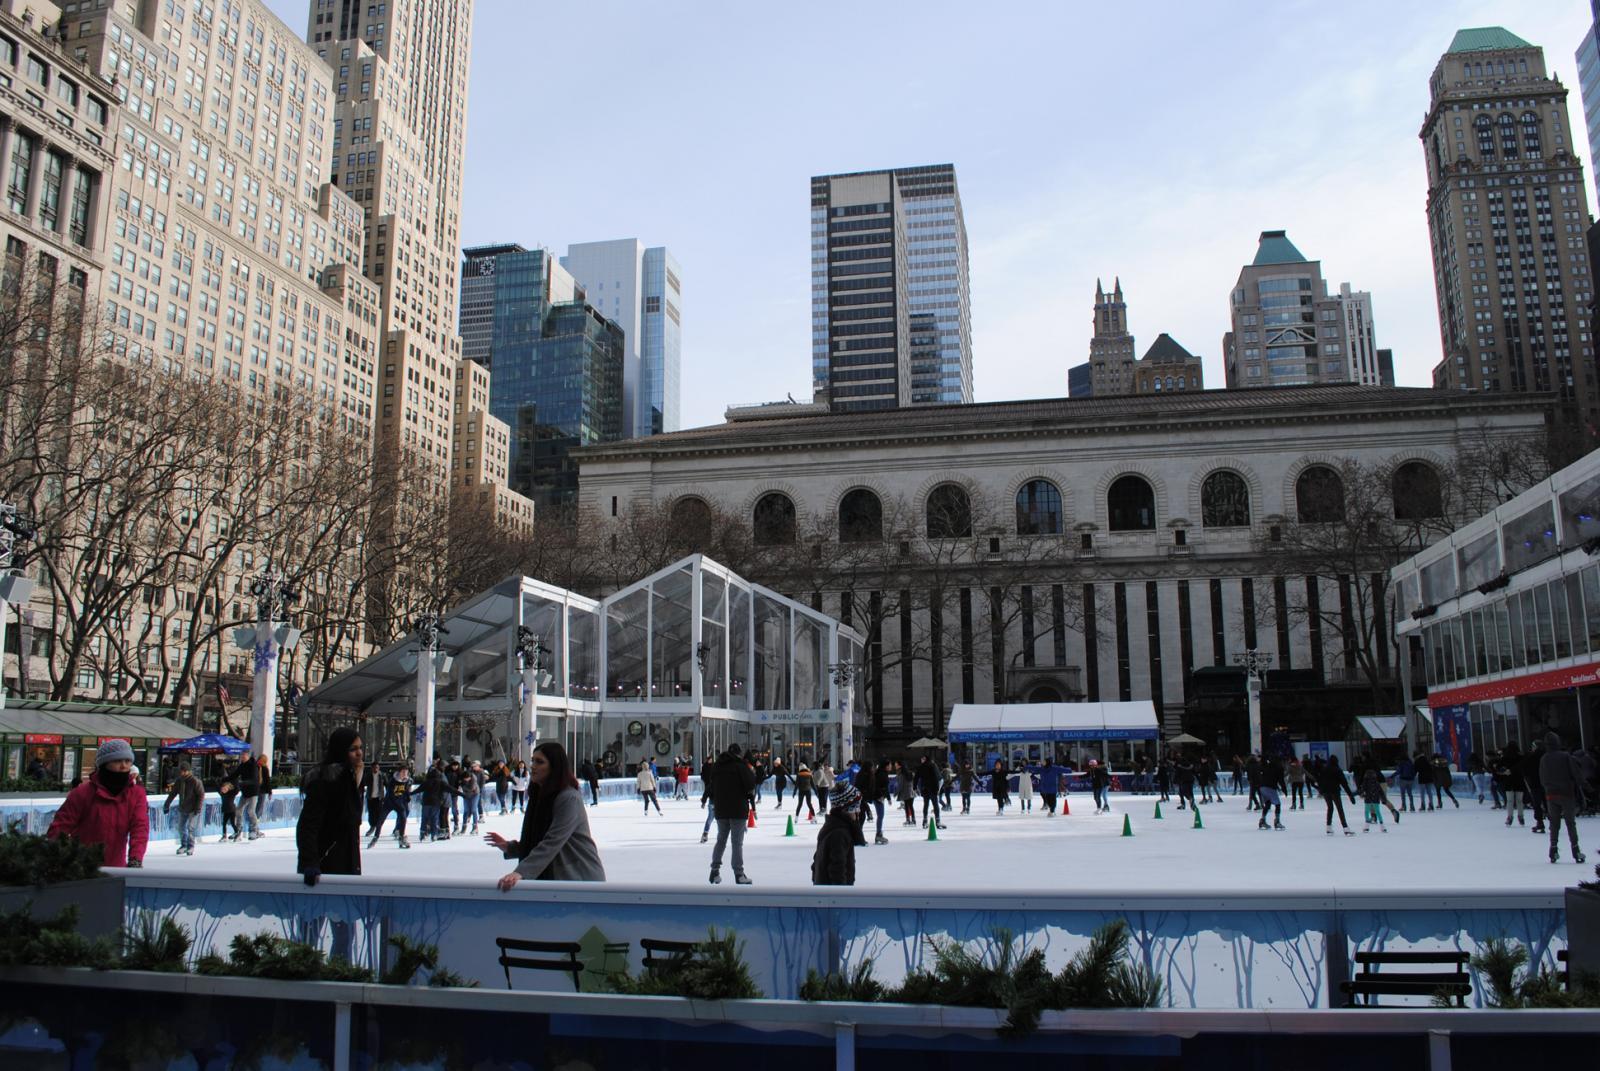 Dezember in New York